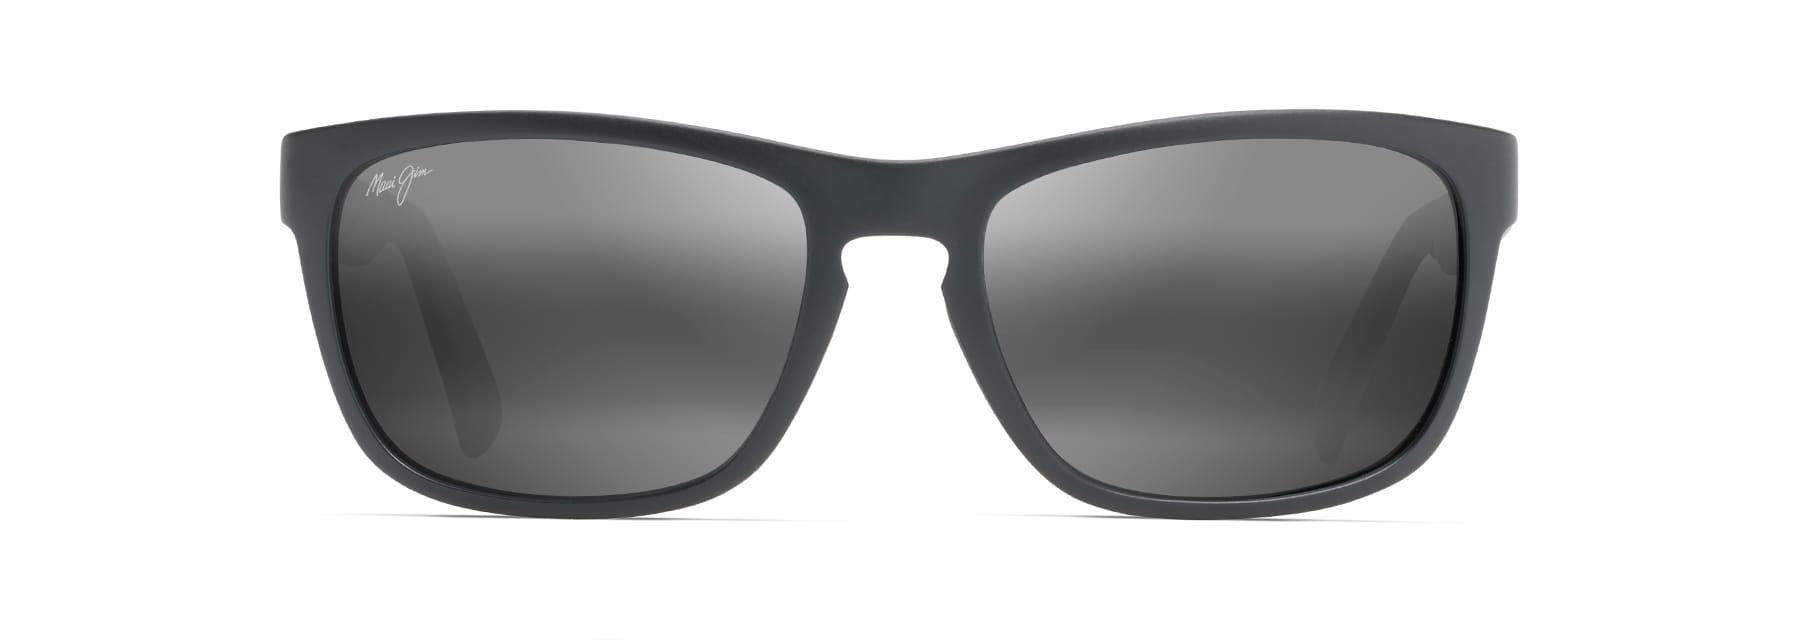 311a967ec2 SOUTH SWELL. Polarized Classic Sunglasses